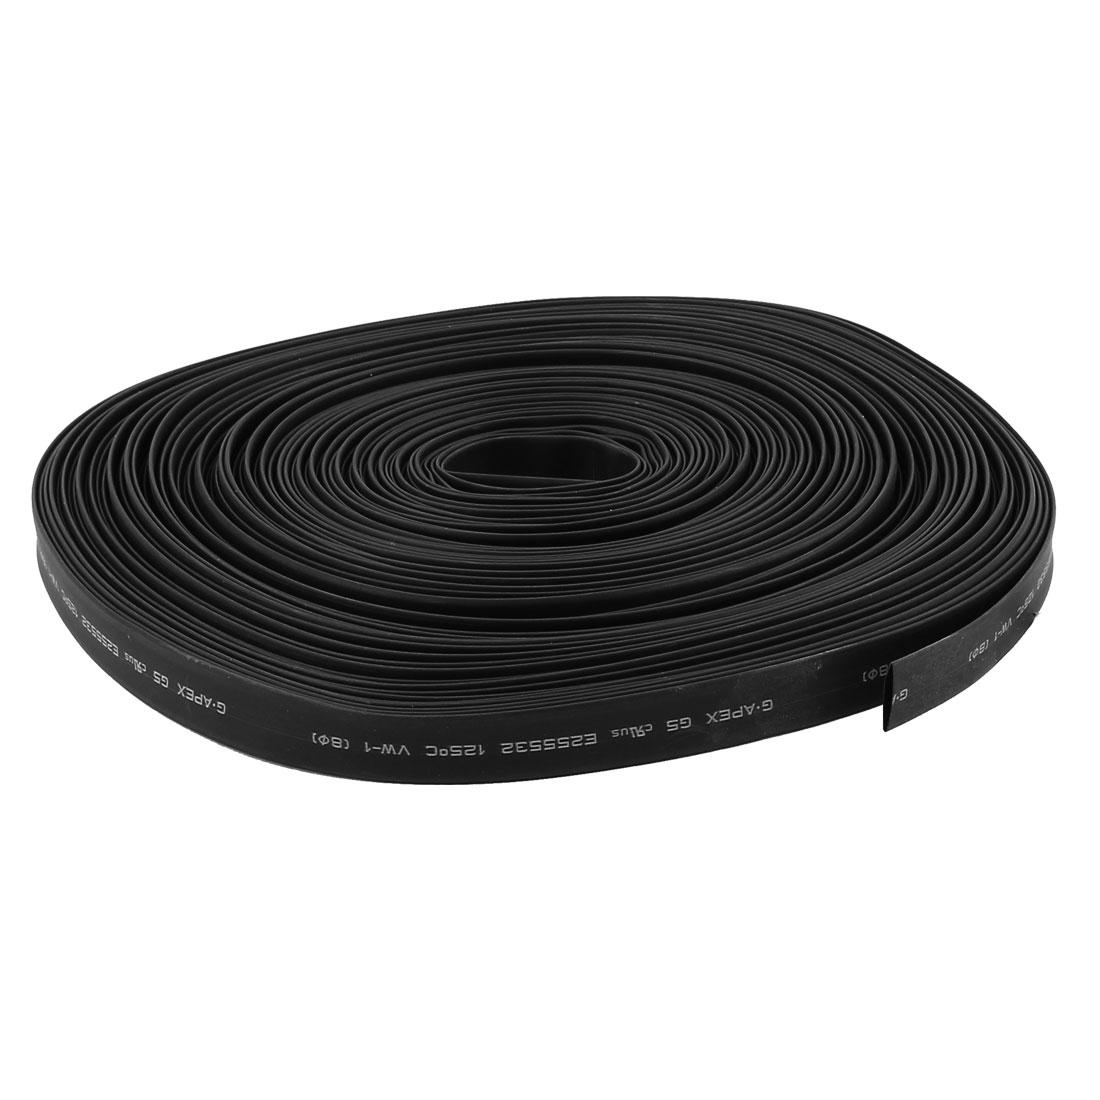 30m 8mm Dia Insulated PE Heat Shrink Tubing 2:1 Shrinkage Ratio Waterproof Black